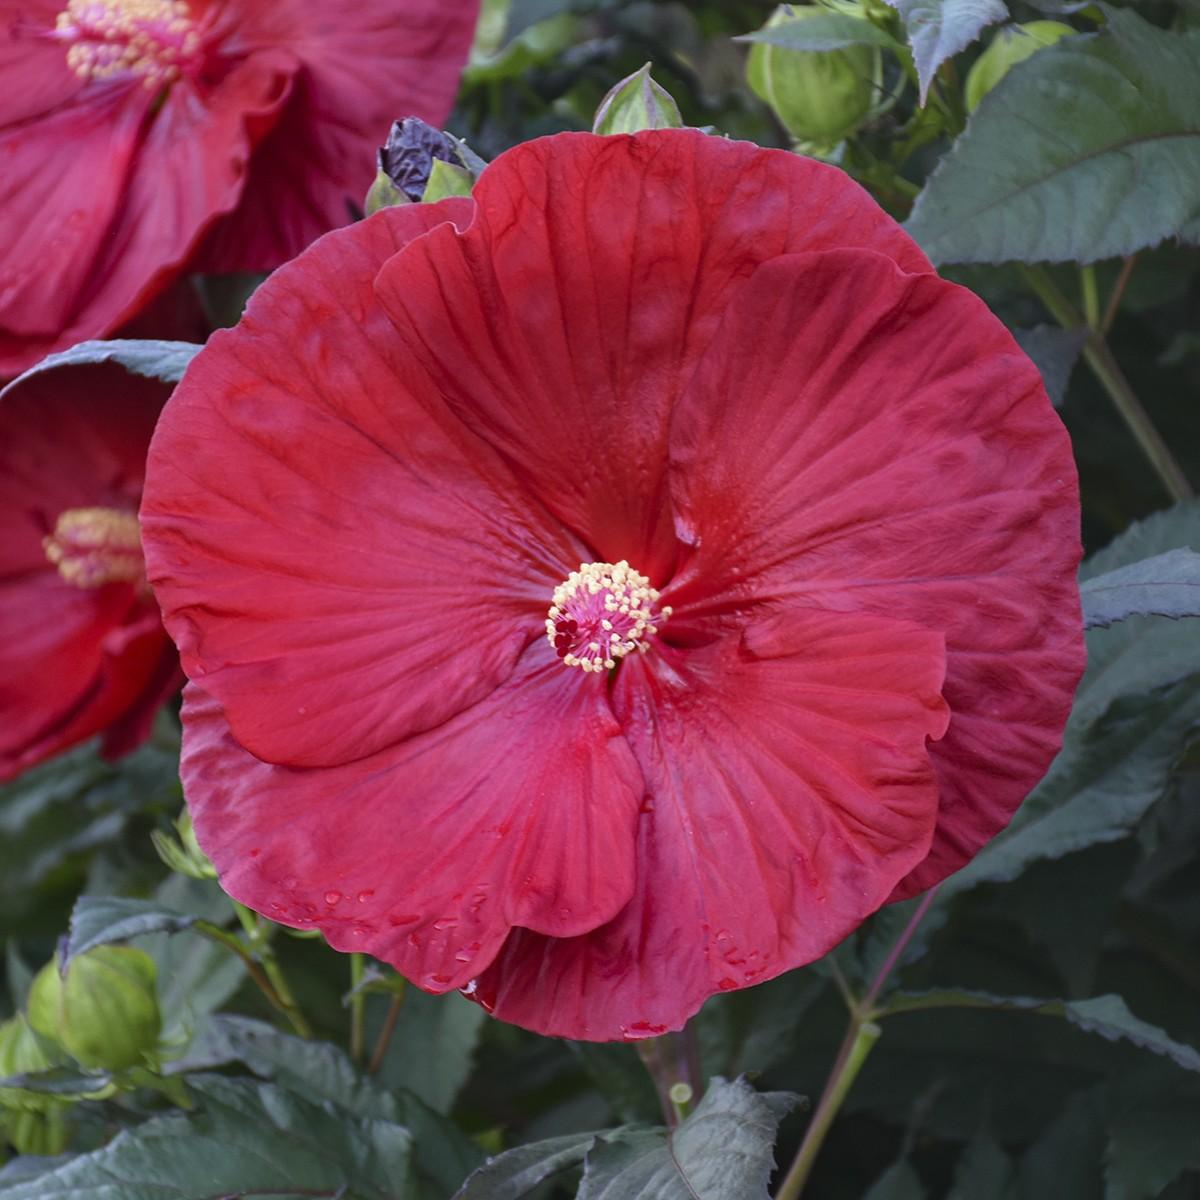 Hibiscus Summerific Cranberry Crush Rose Mallow Thetreefarmcom